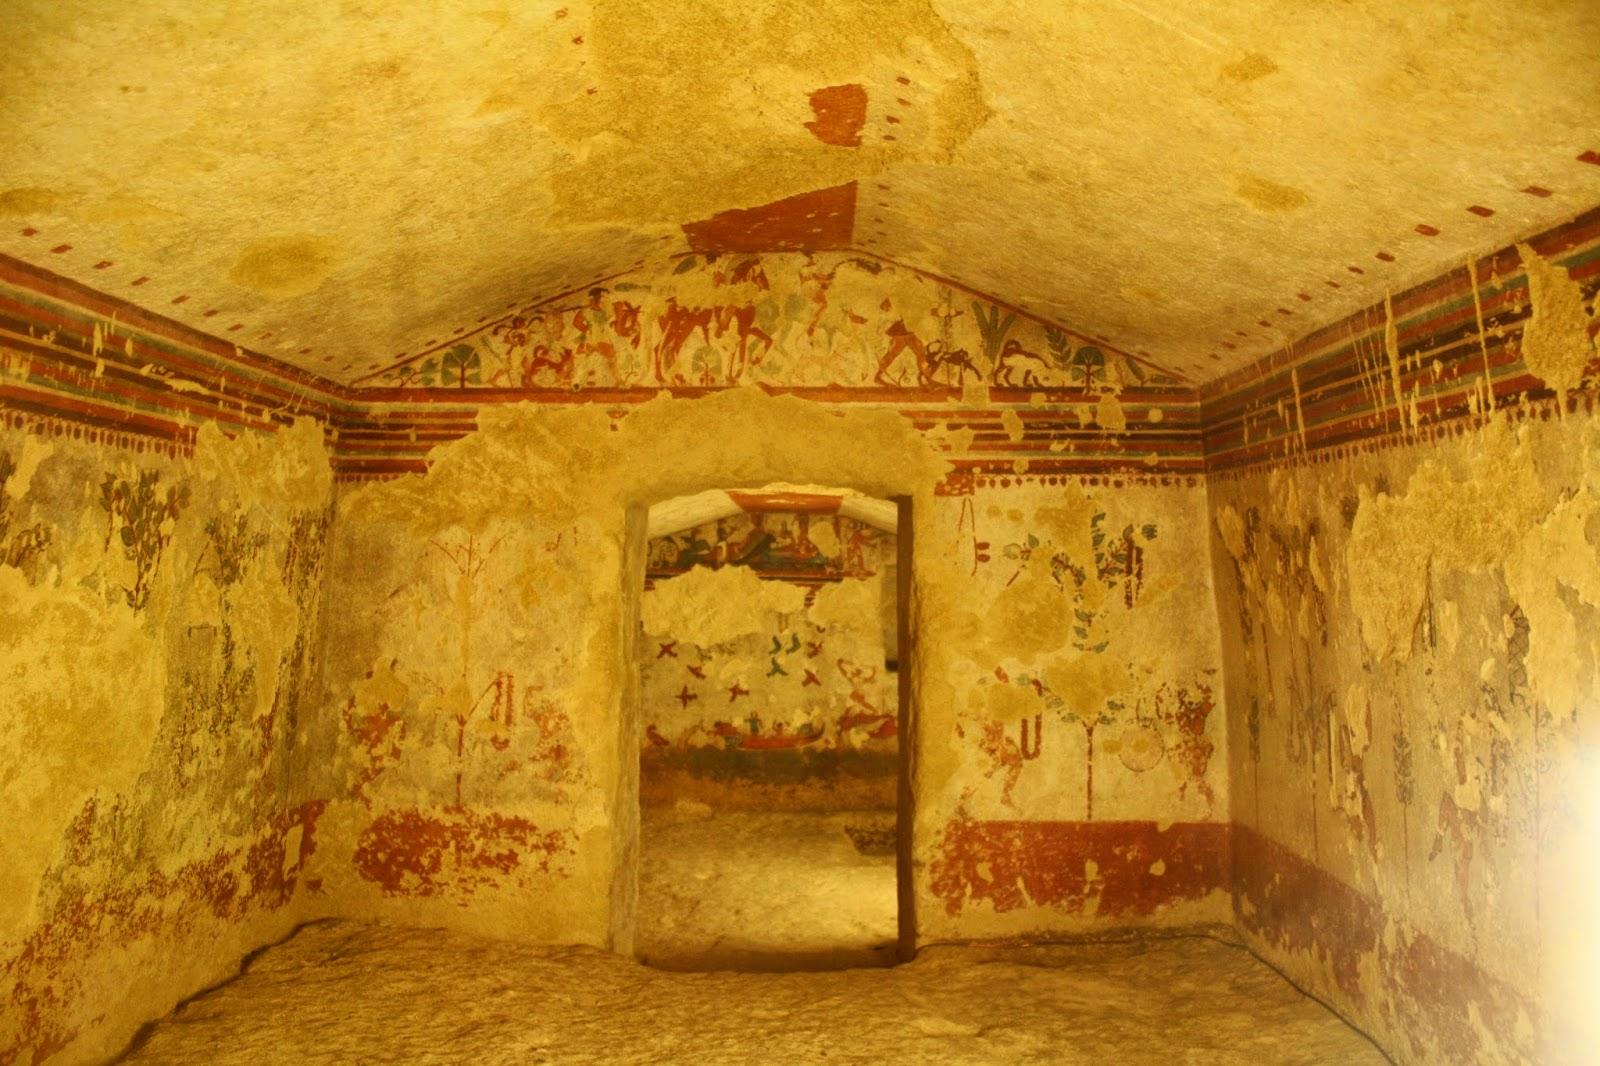 Interior tumba de la Necrópolis etrusca de Tarquinia